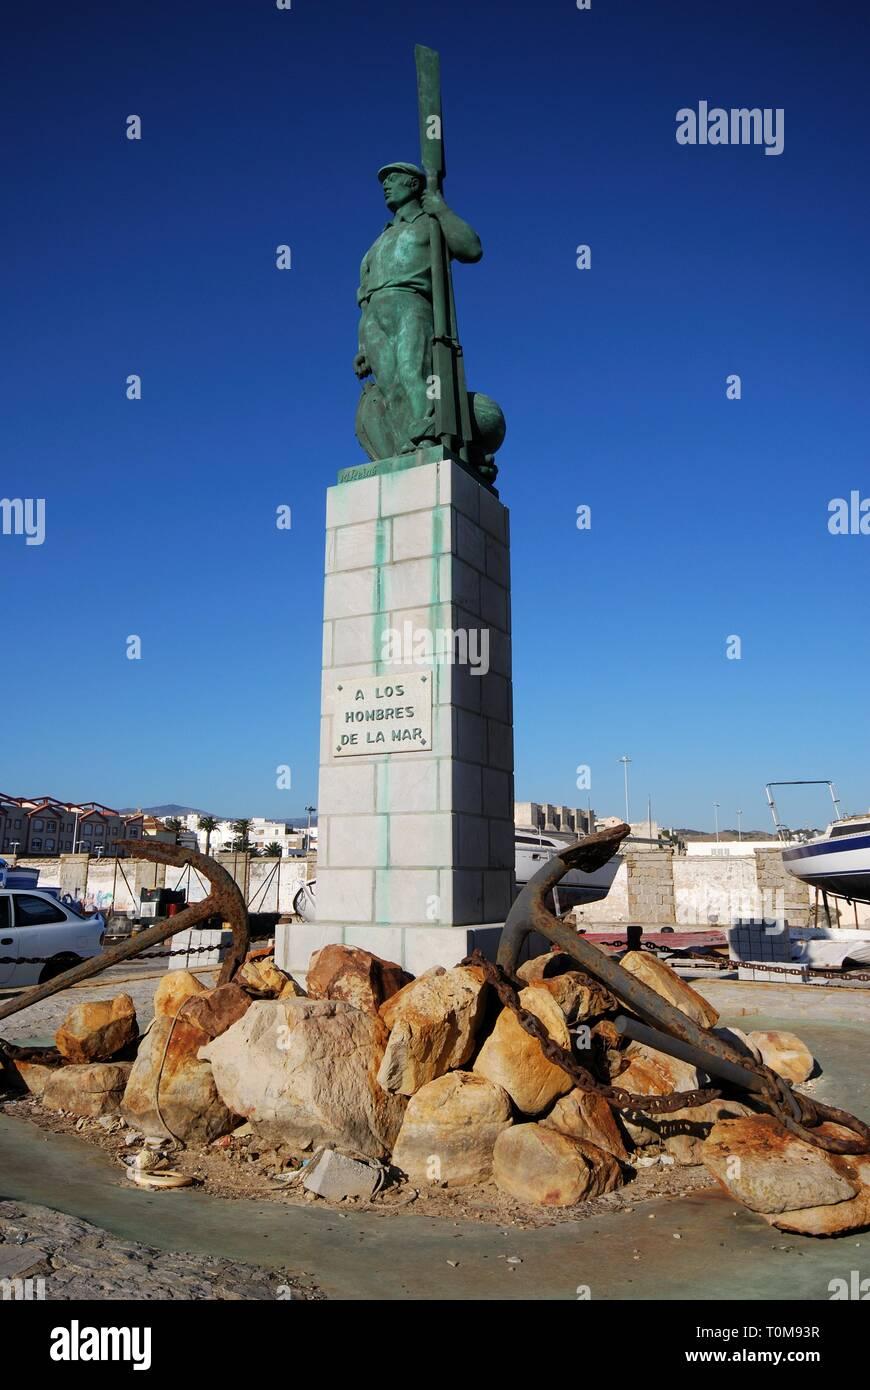 TARIFA, SPAIN - SEPTEMBER 14, 2008 - View of the fisherman statue in the port (A Los Hombres de la Mar), Tarifa, Cadiz Province, Andalusia, Spain, Eur - Stock Image